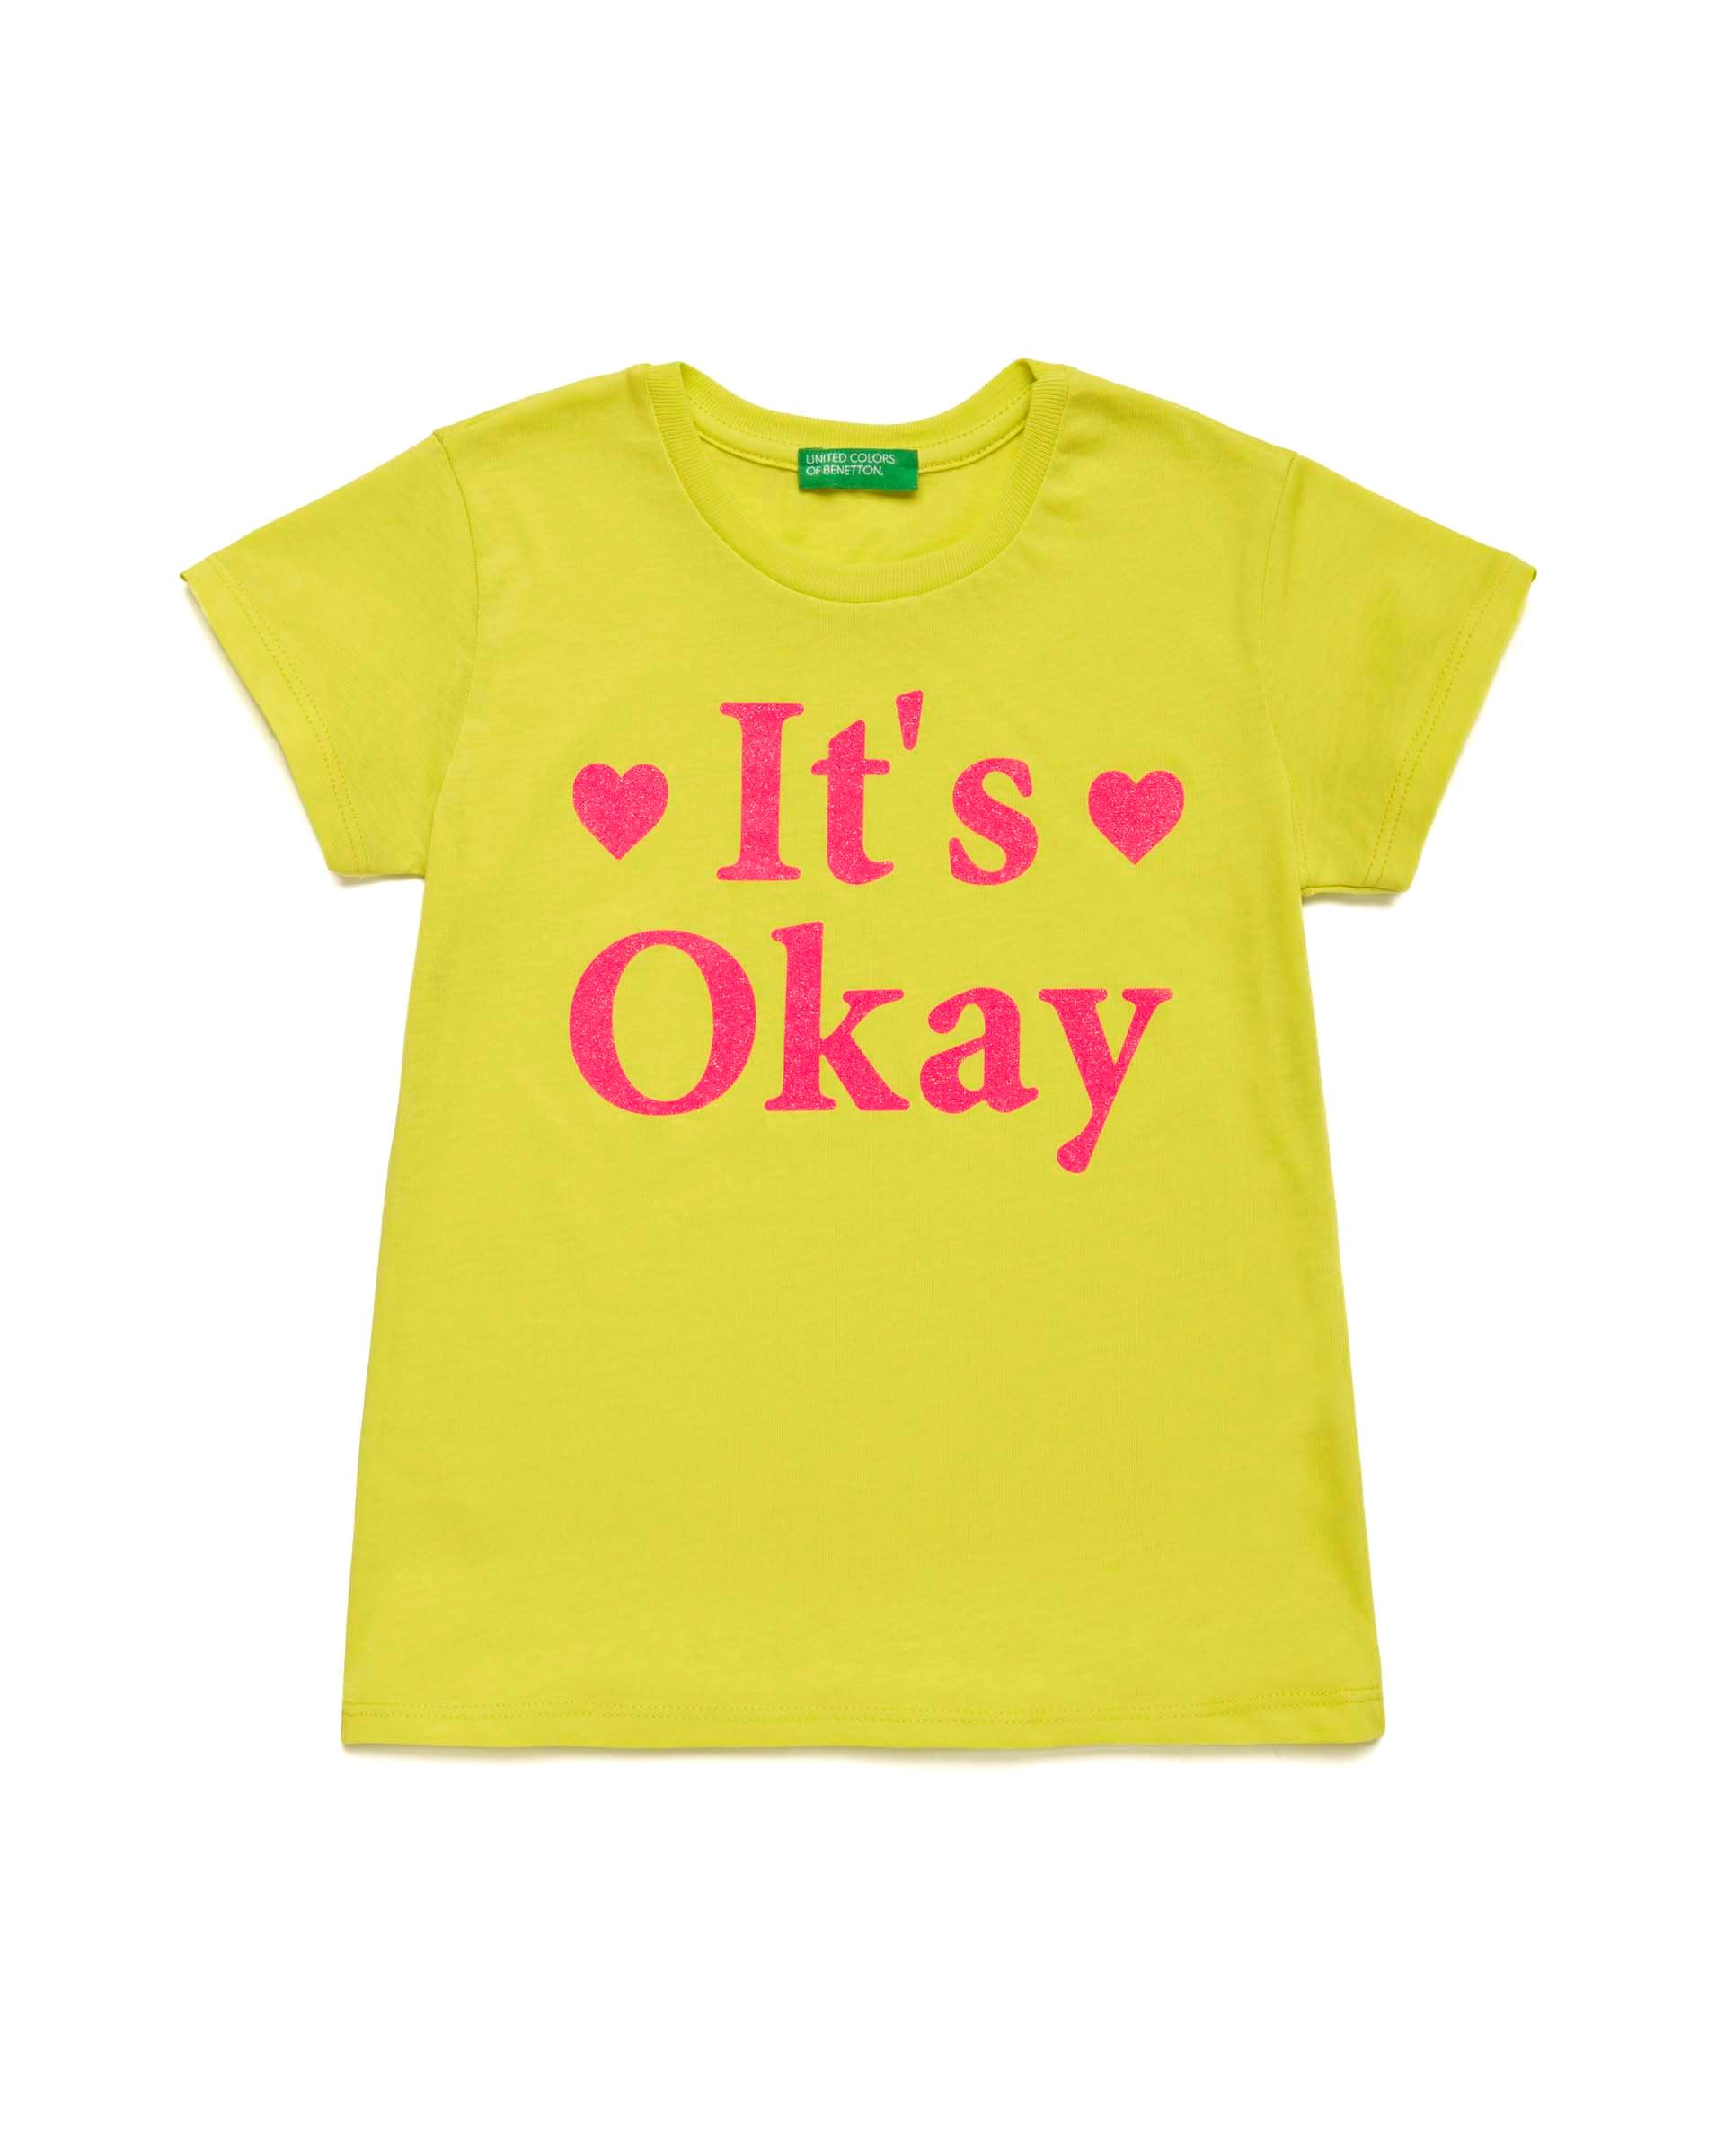 Купить 20P_3I1XC14KM_28M, Футболка для девочек Benetton 3I1XC14KM_28M р-р 152, United Colors of Benetton, Футболки для девочек